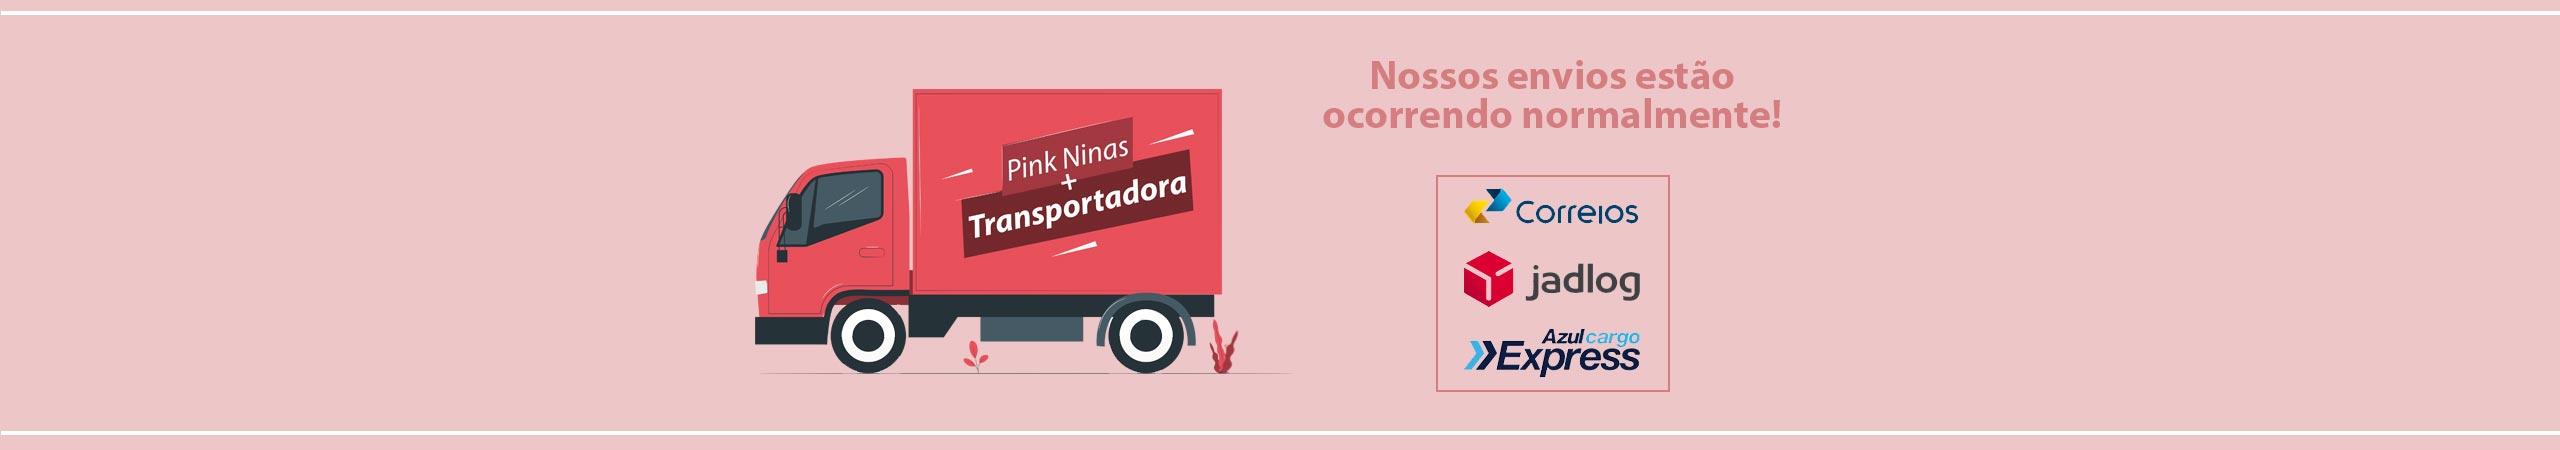 Transportadoras Pink Ninas